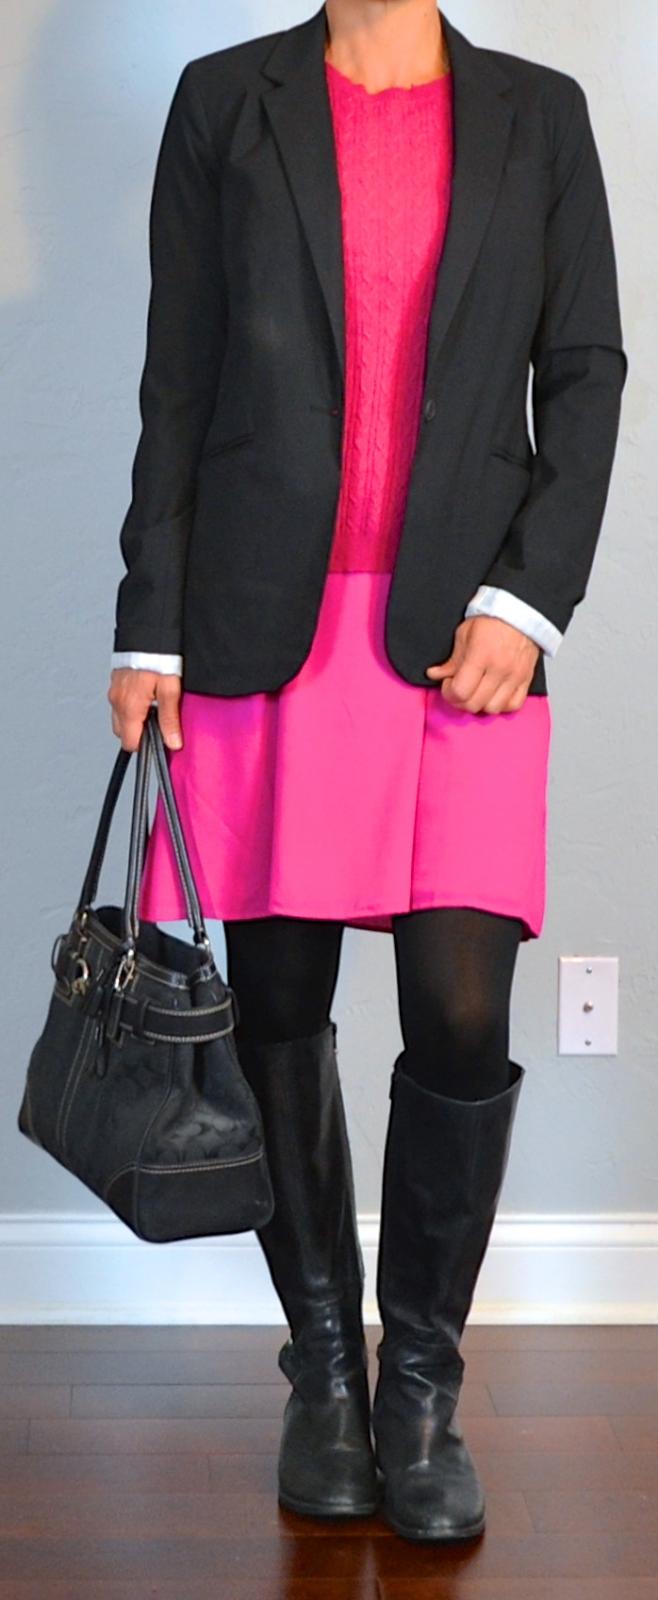 Outfit Post Pink Dress Pink Sweater Black Boyfriend Blazer. Black Boots